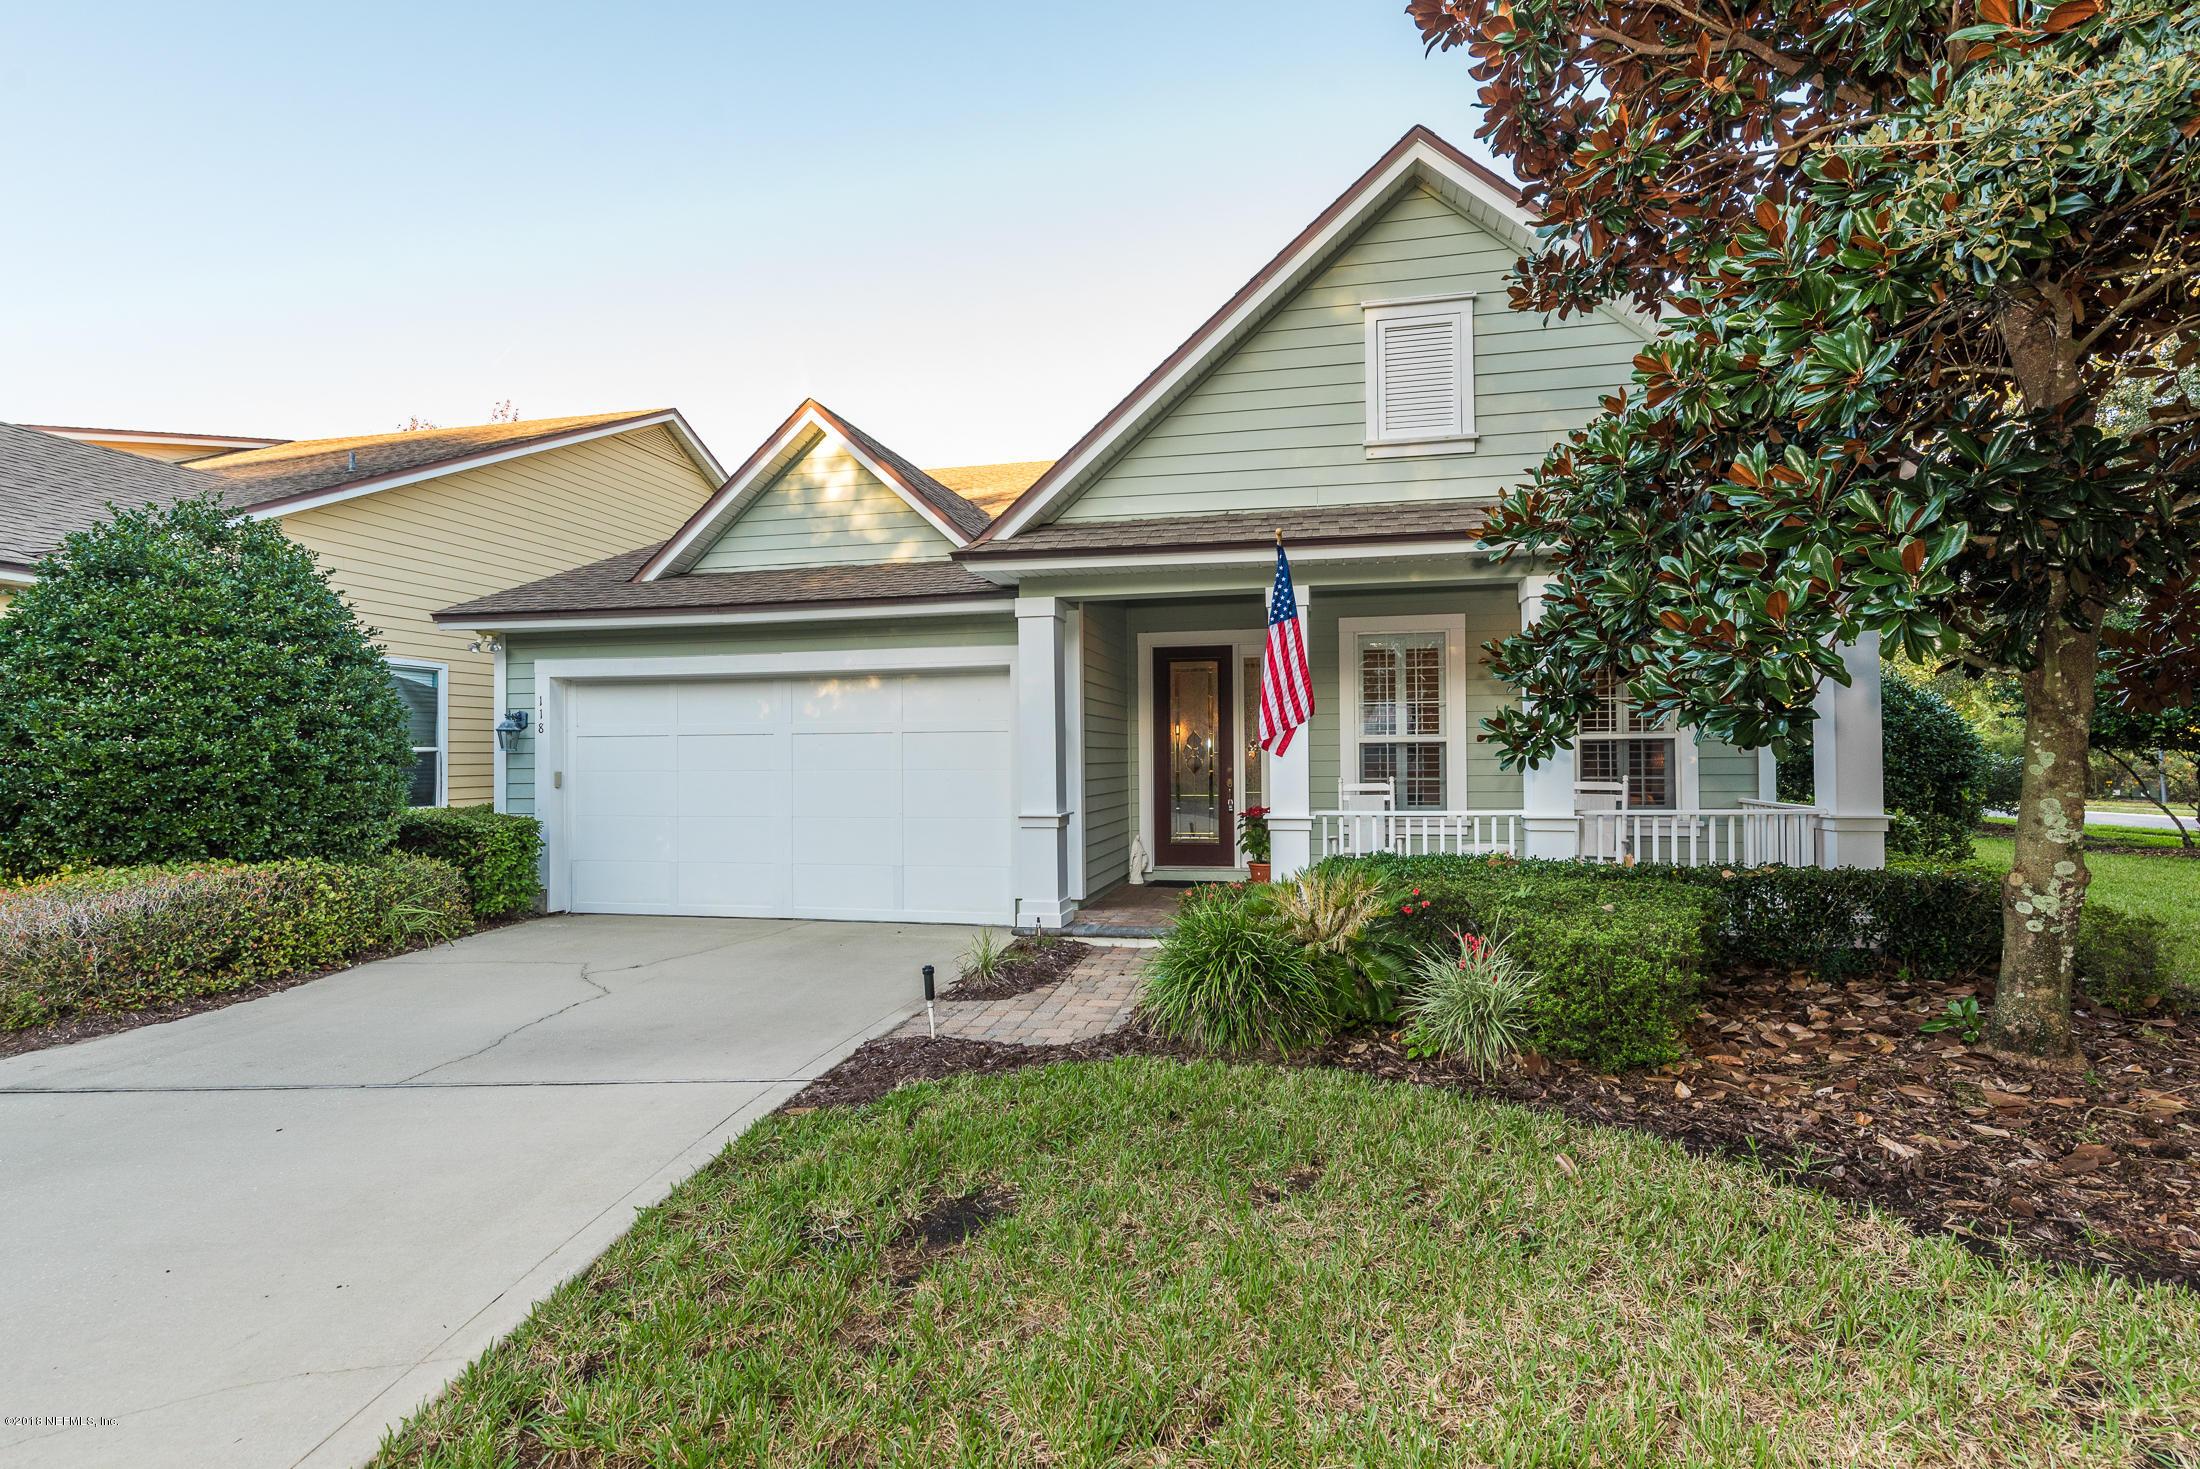 118 VILLAGE, ST AUGUSTINE, FLORIDA 32095, 3 Bedrooms Bedrooms, ,2 BathroomsBathrooms,Residential - single family,For sale,VILLAGE,970543